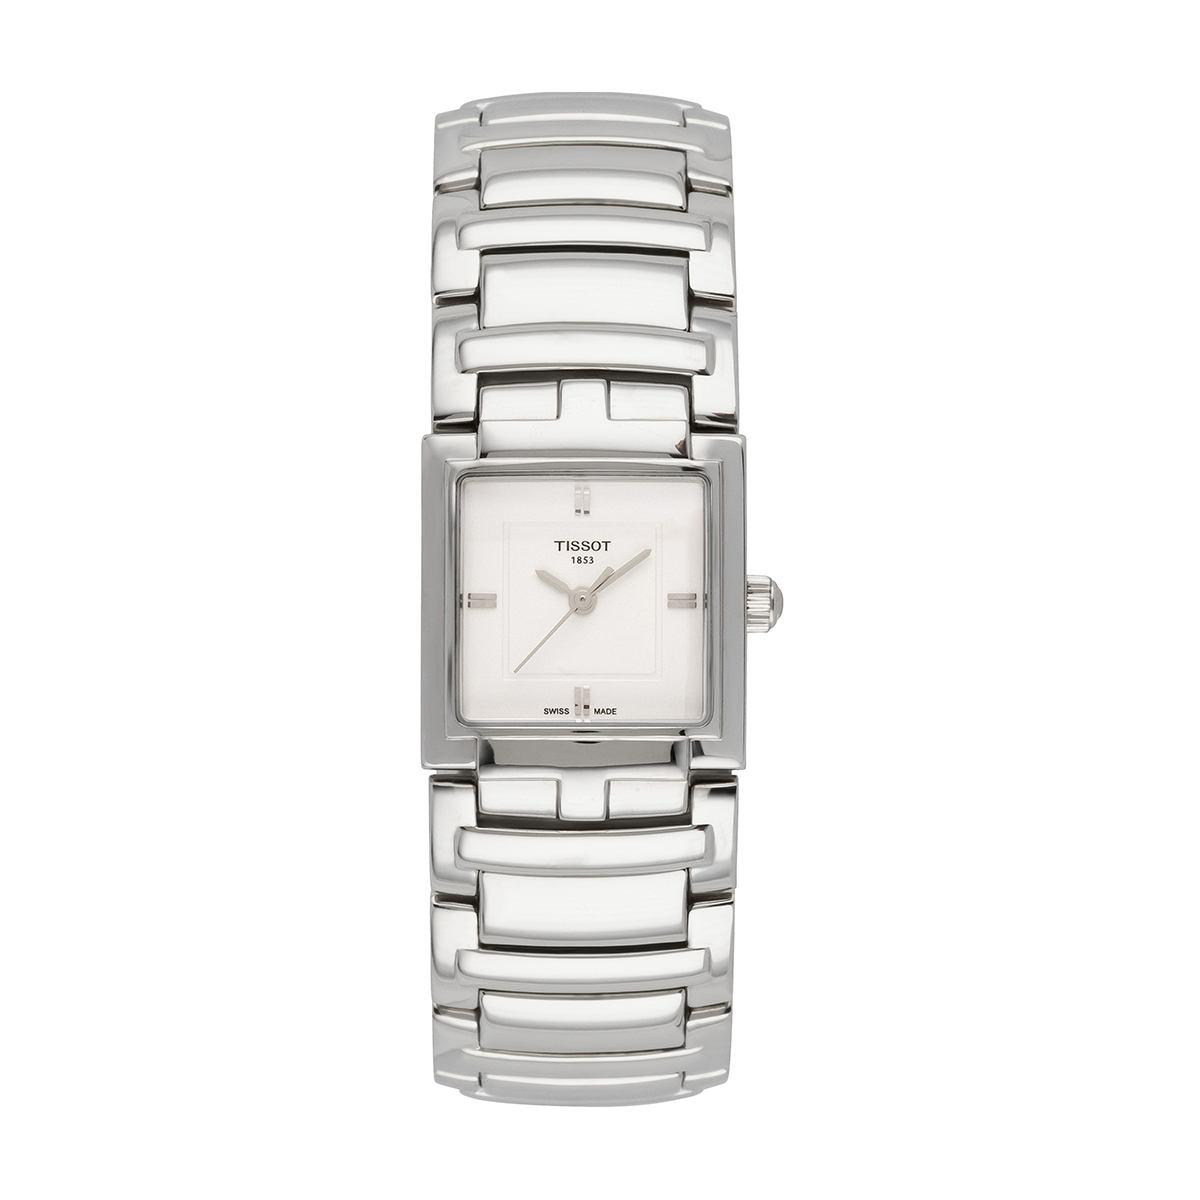 Часовник Tissot T051.310.11.031.00